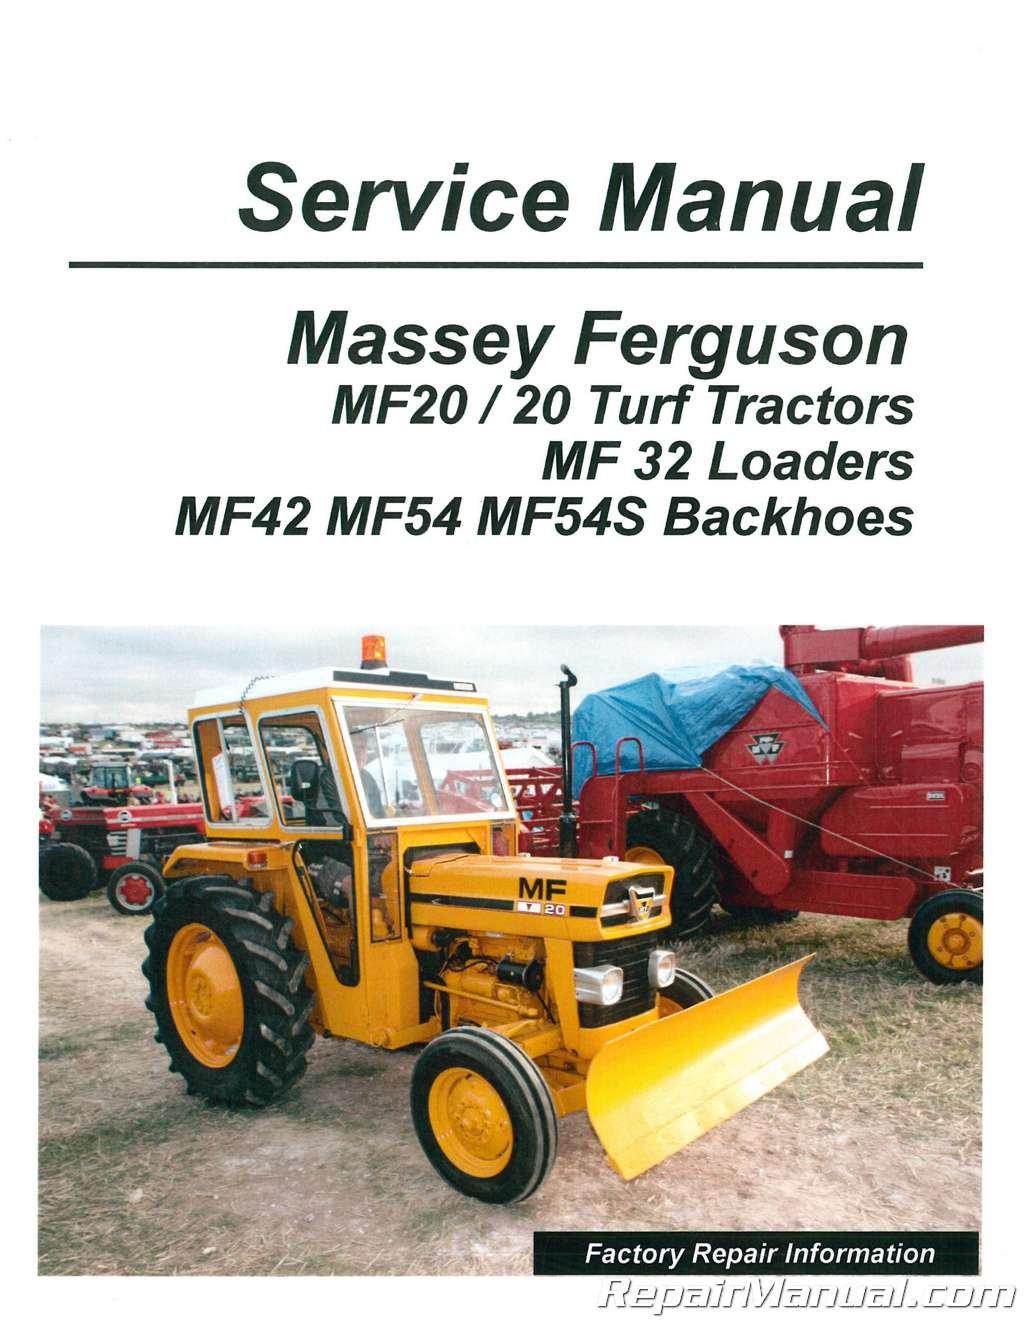 MH-S-MF20-TLB Massey Ferguson MF 20 MF32 MF42 MF54 Tractor Loader Backhoe  Service Manual: Manufacturer: Amazon.com: Books